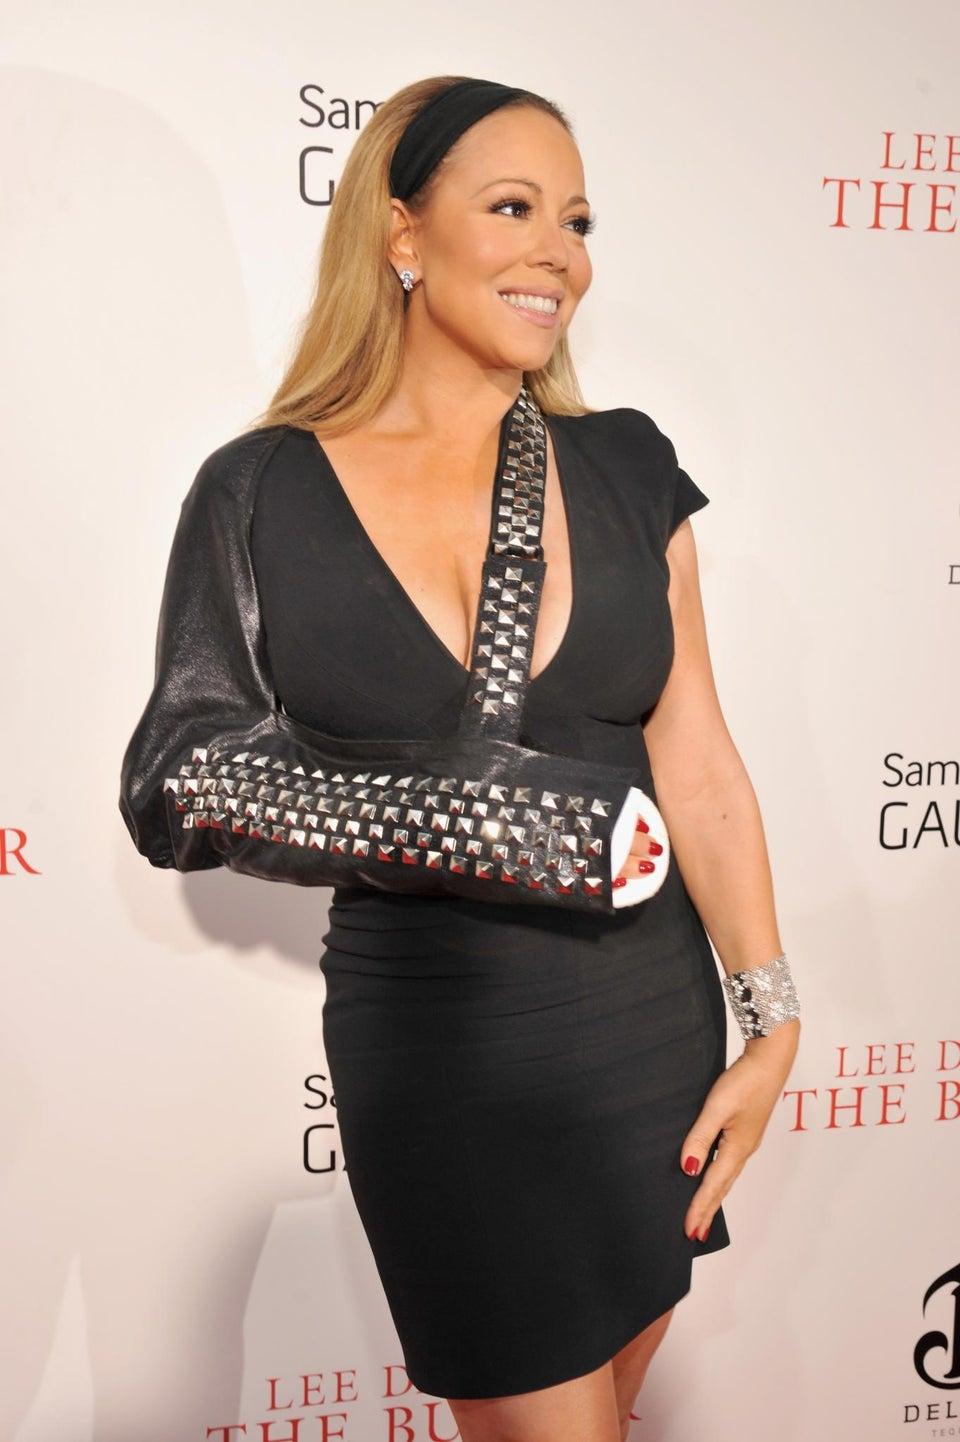 Mariah Carey Blames Shoulder Injury on 'Fatigue'